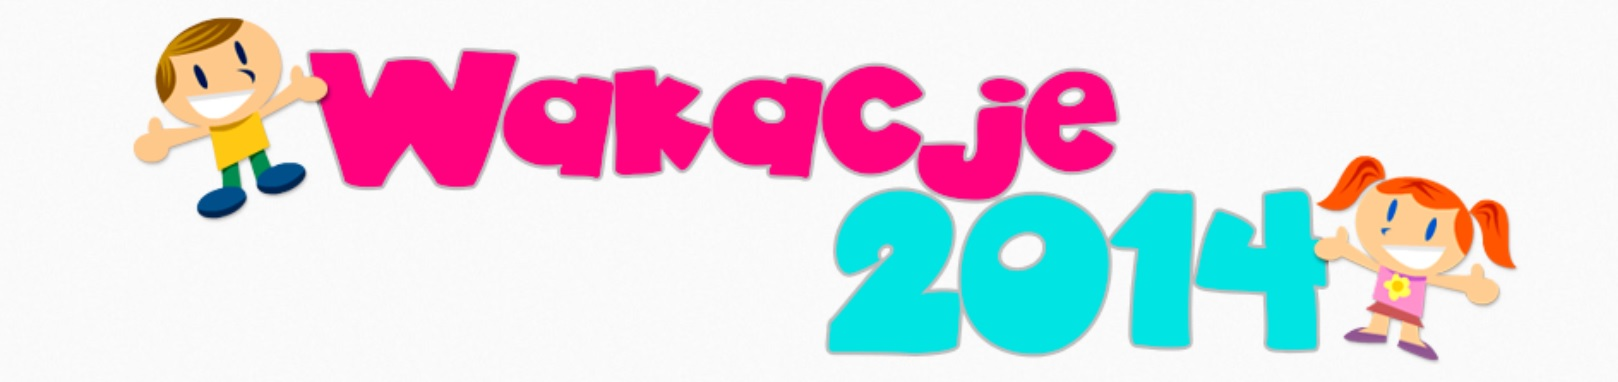 wakacje 2014 2